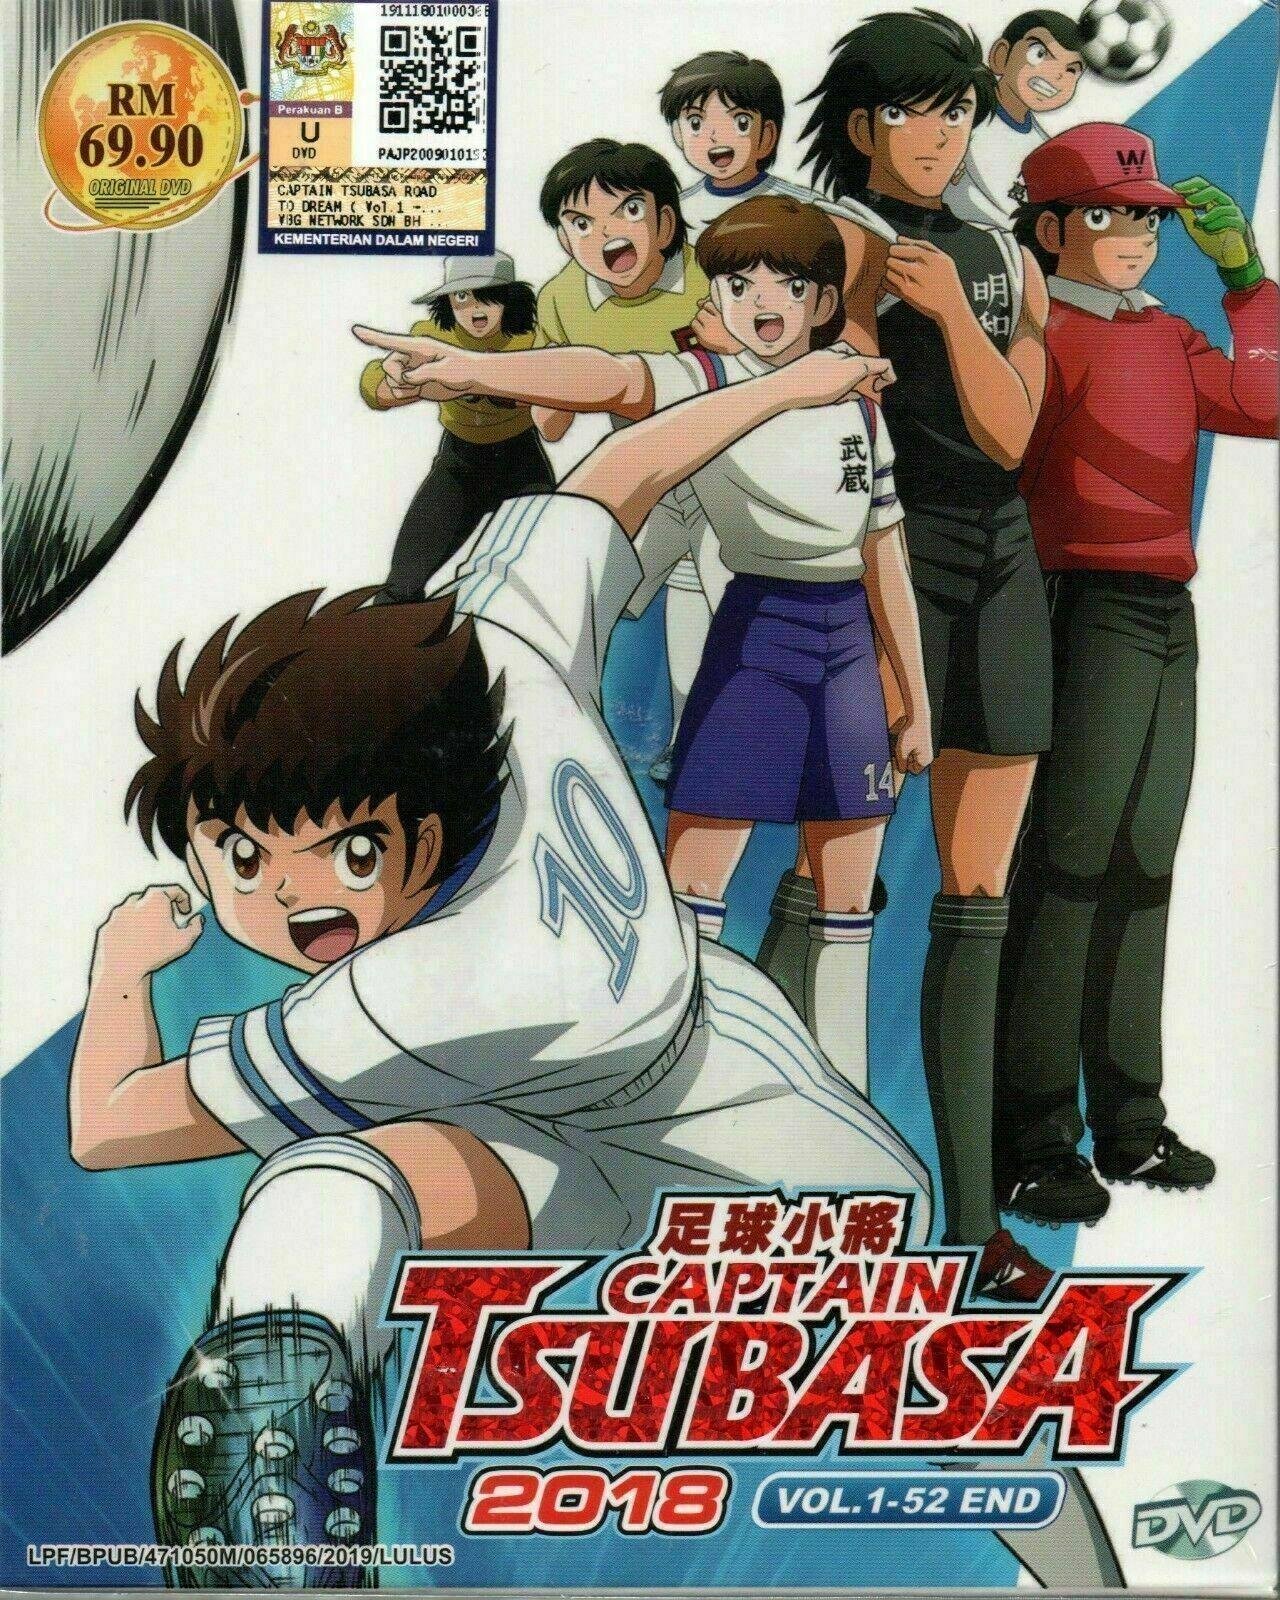 Captain Tsubasa (2018) VOL.1-52 End - US Seller ship out From USA